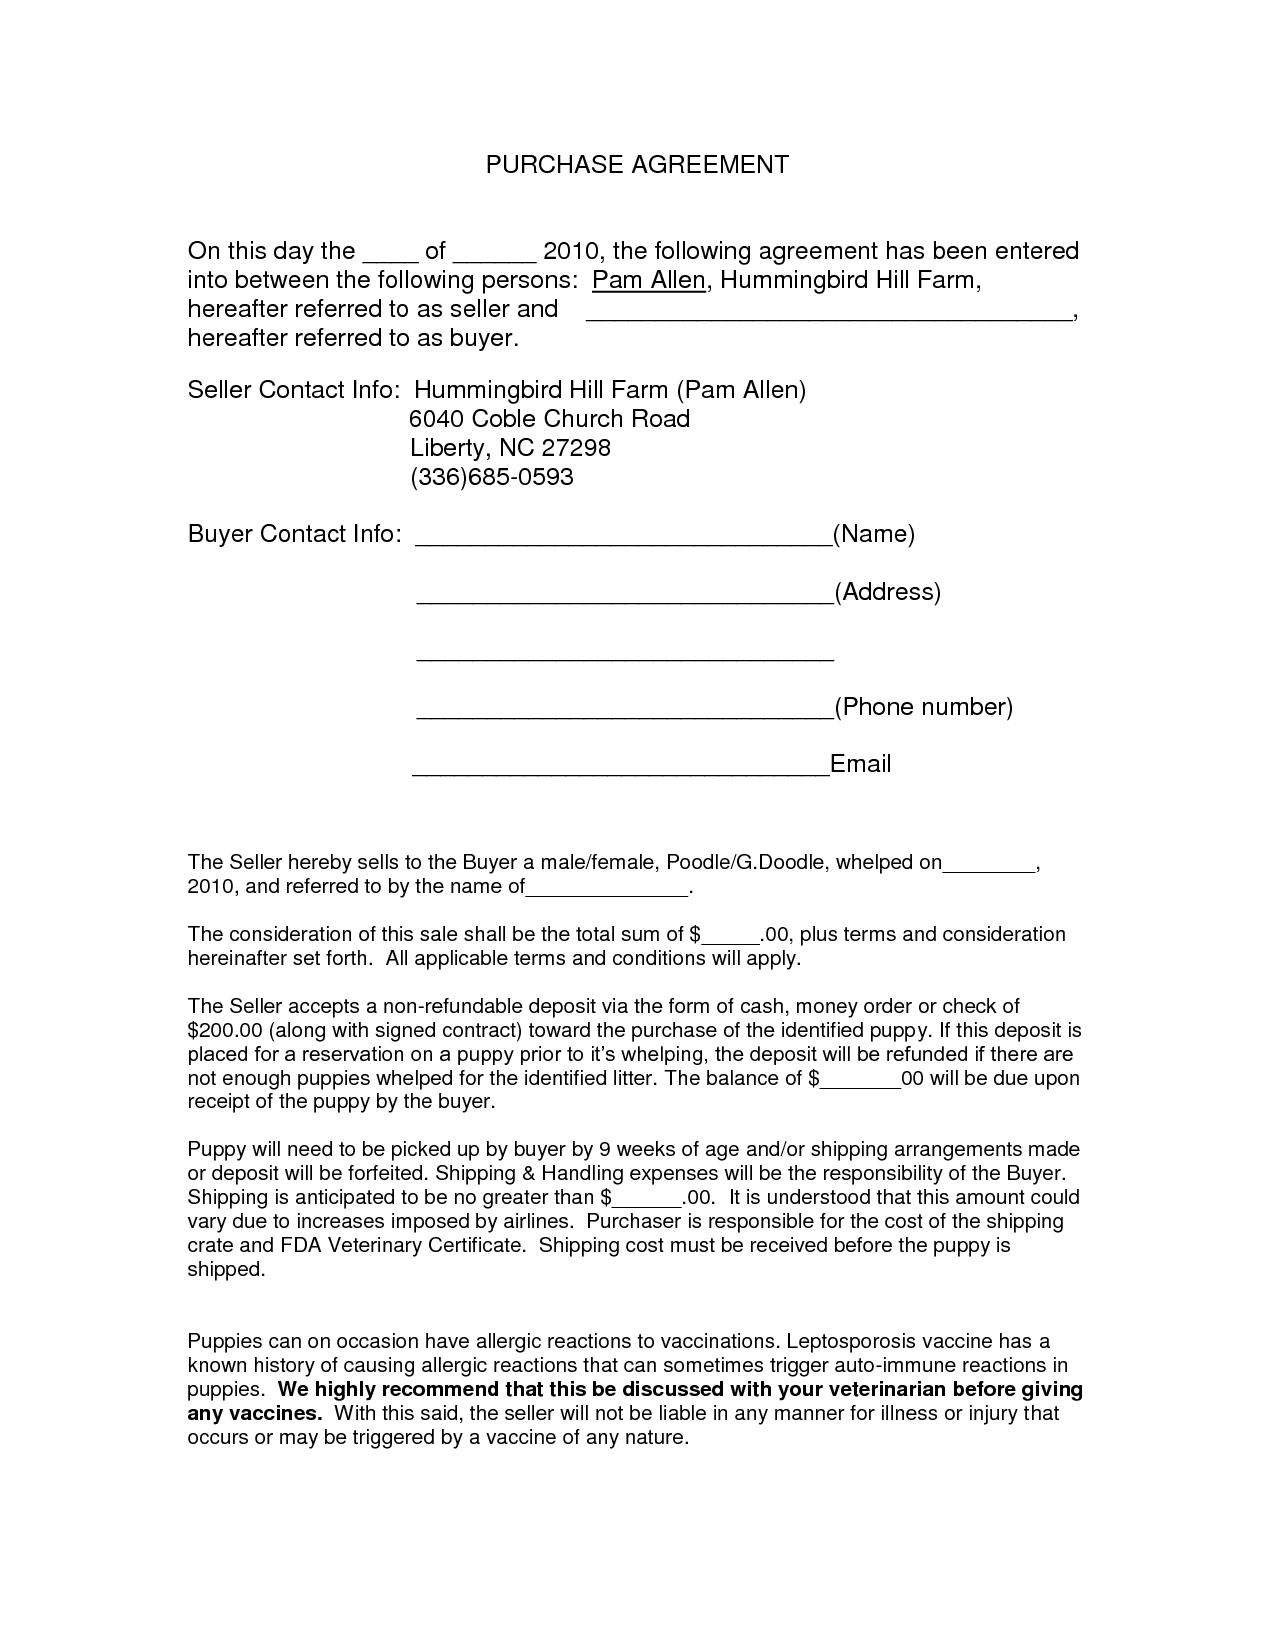 Car Payment Contract Template Hunecompany Com